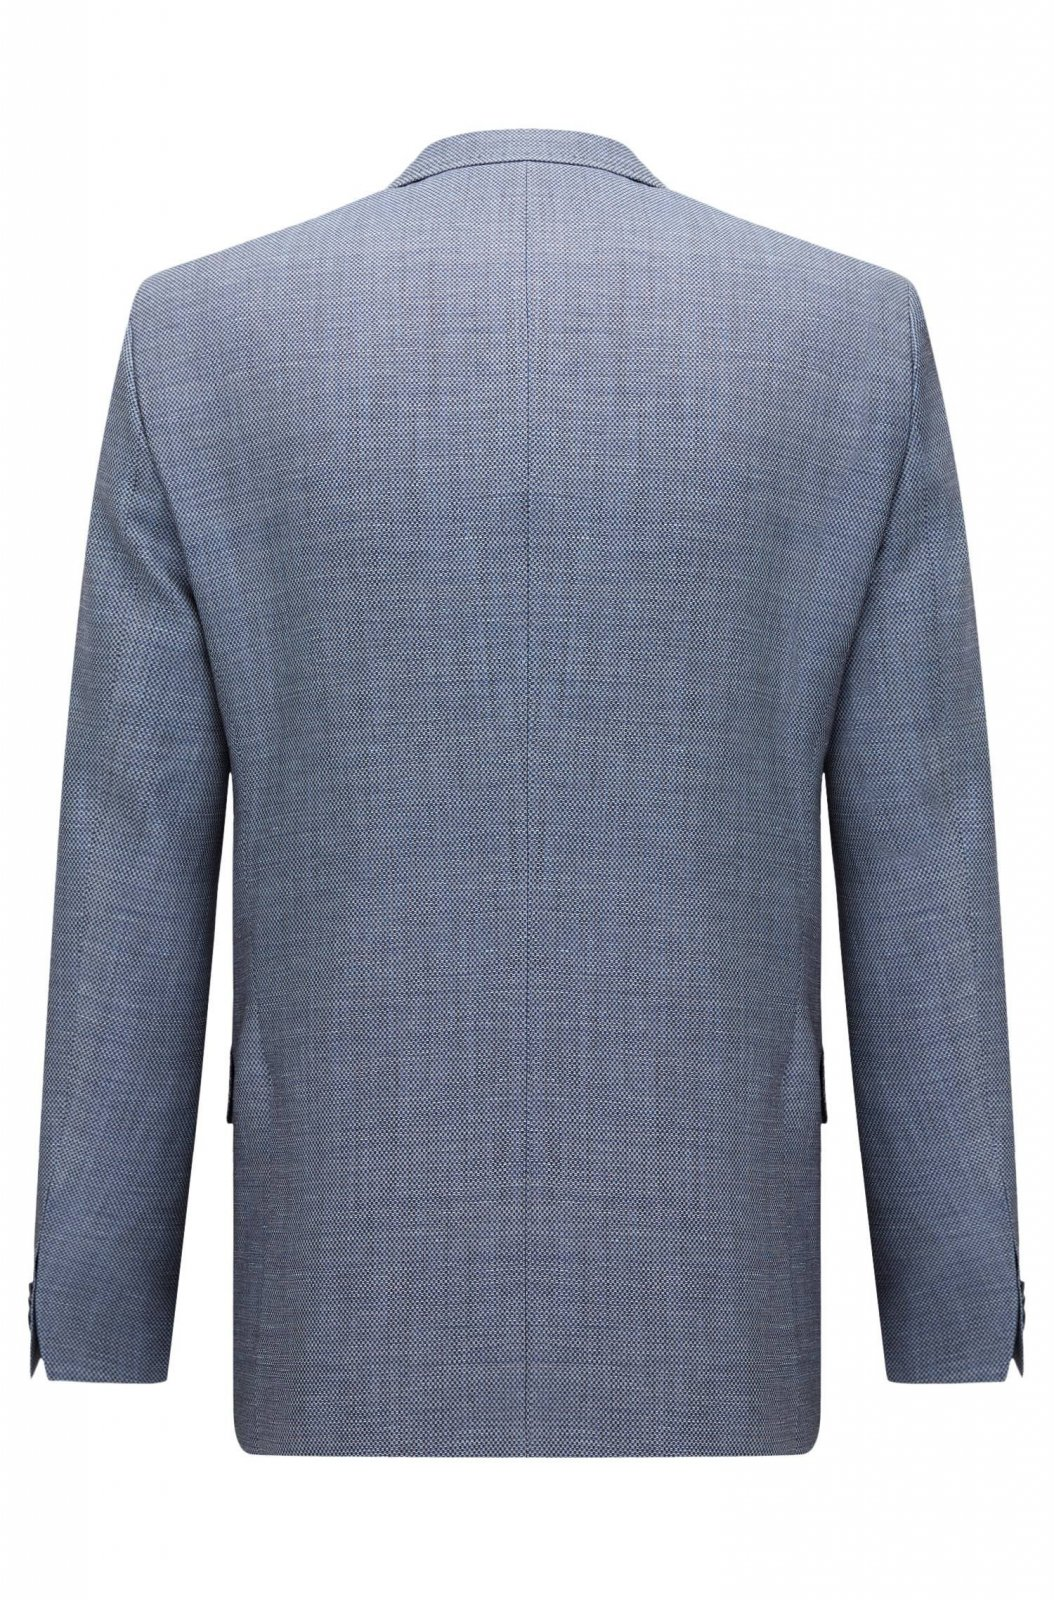 hugo boss veste d t hutson 50333687 veste pour homme. Black Bedroom Furniture Sets. Home Design Ideas